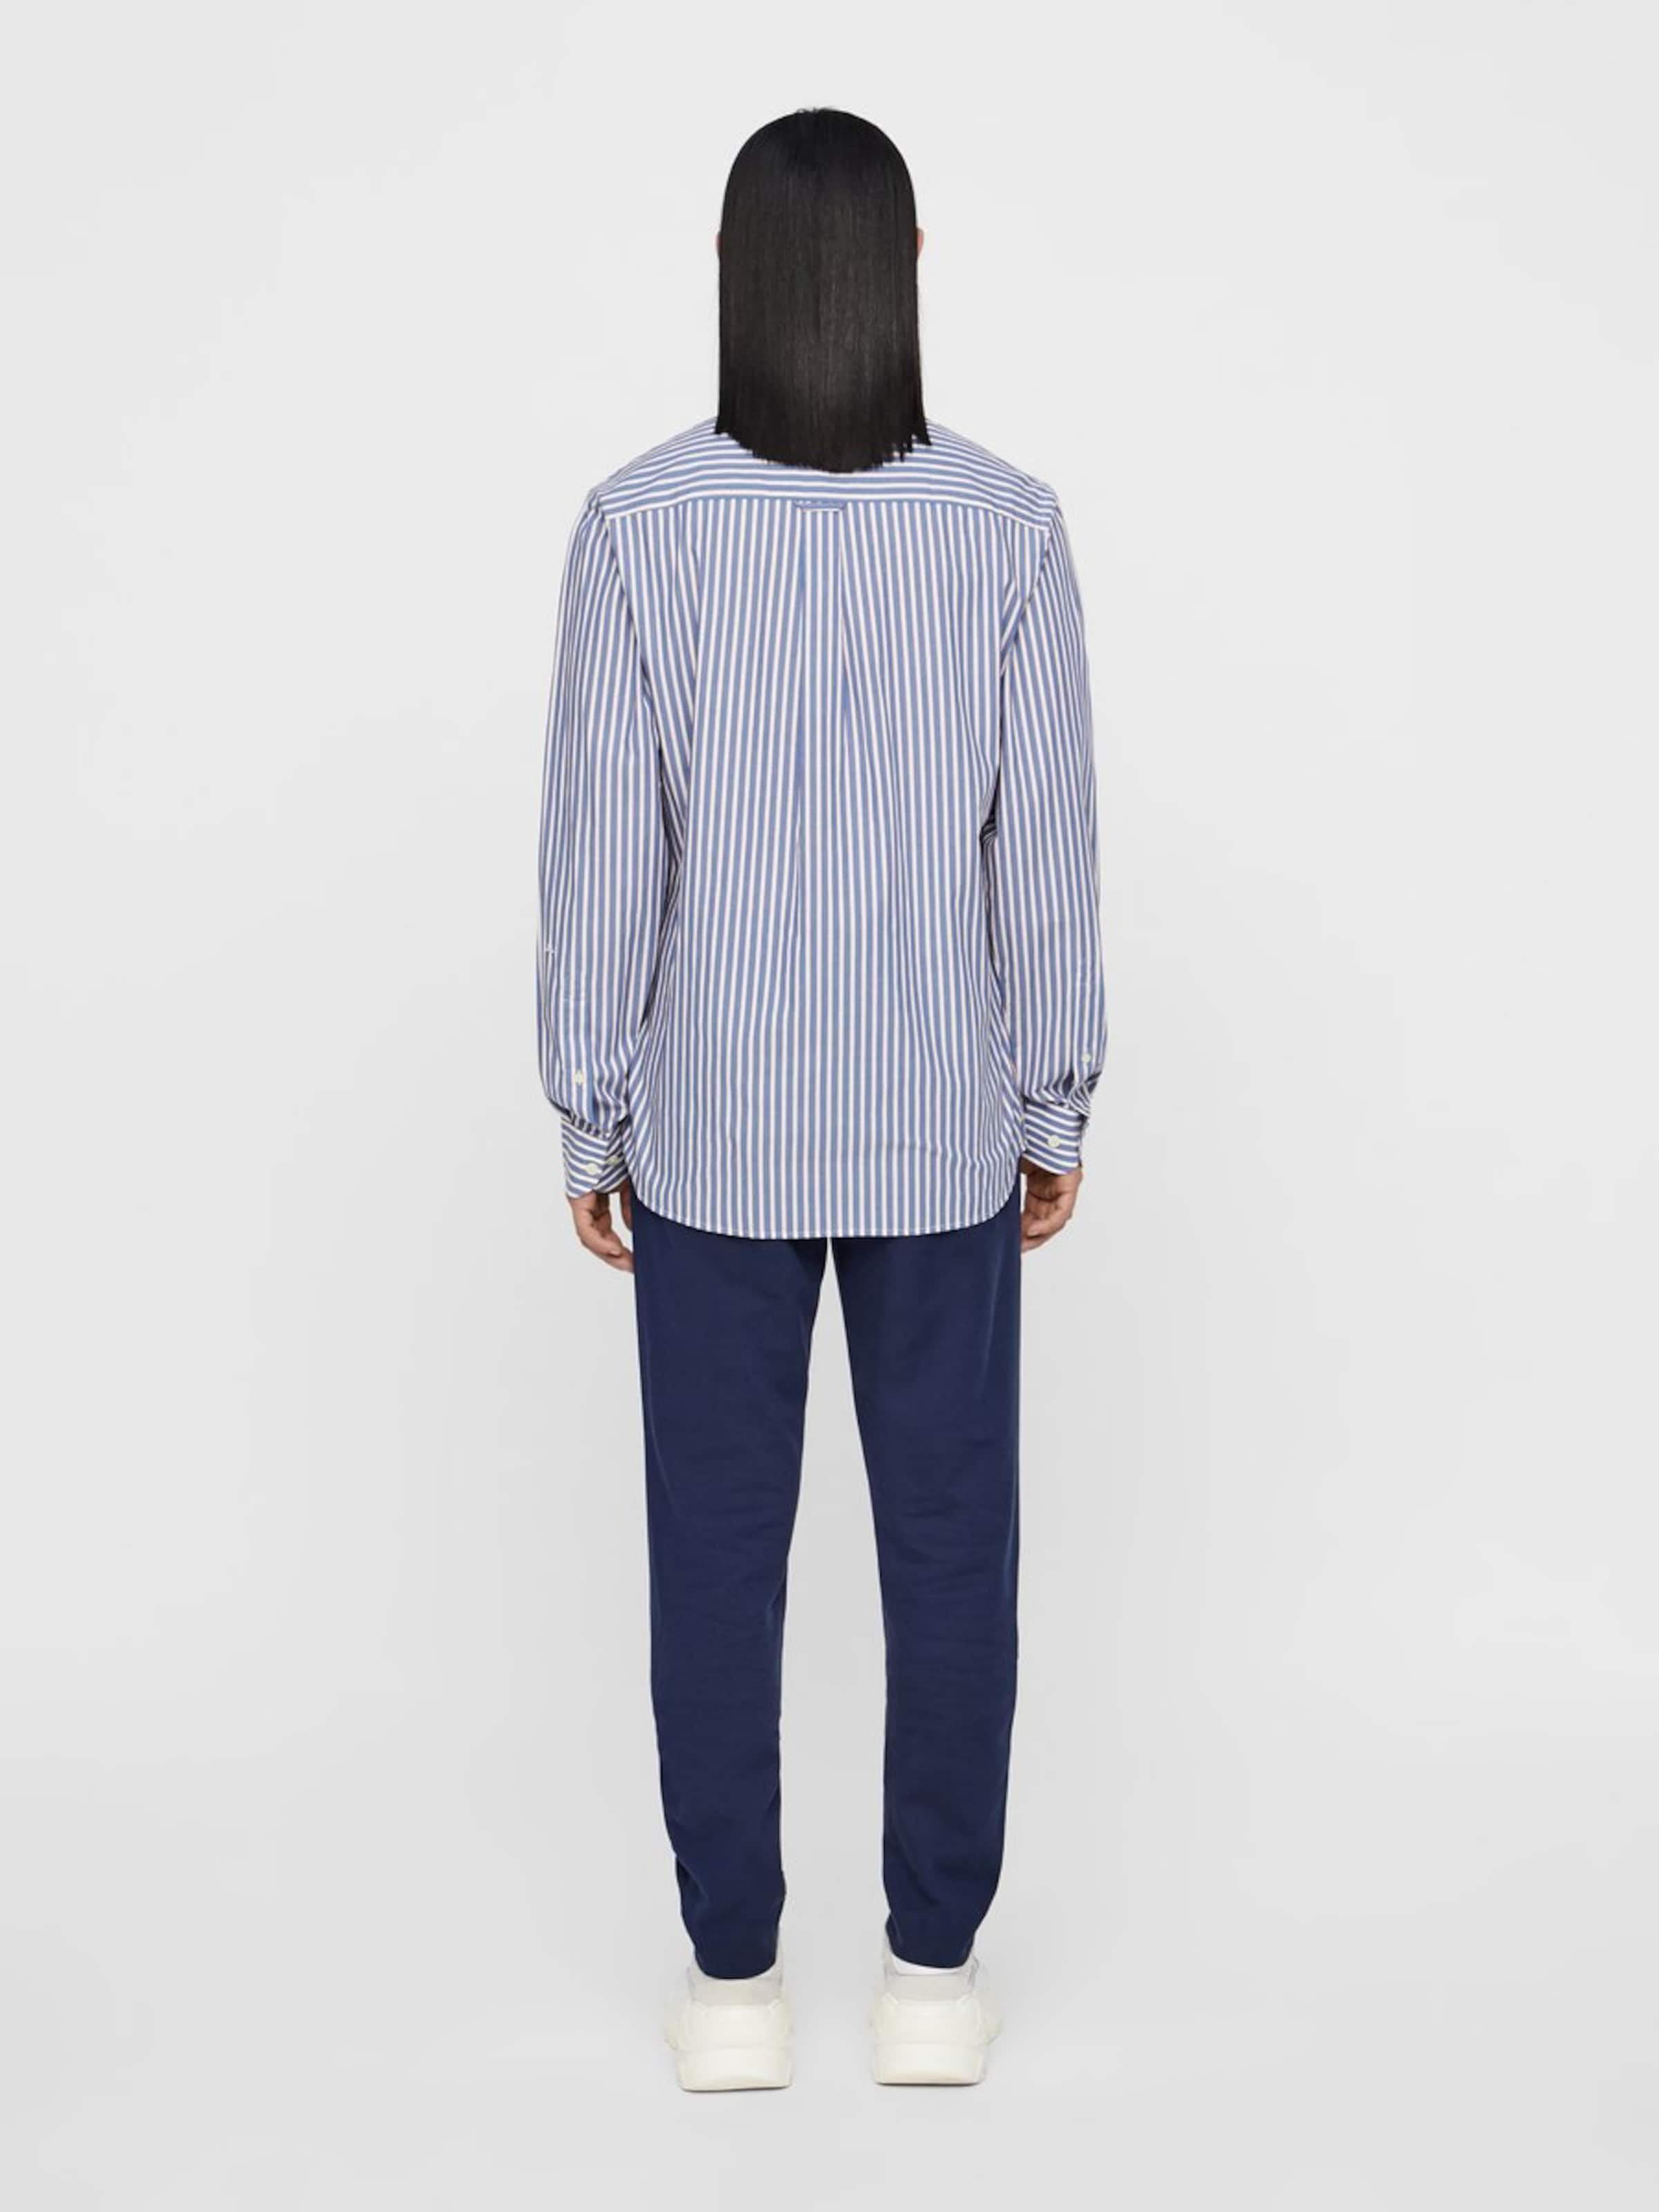 lindeberg J 'daniel In Overhemd pop' DuifblauwWit 8wOPn0kX